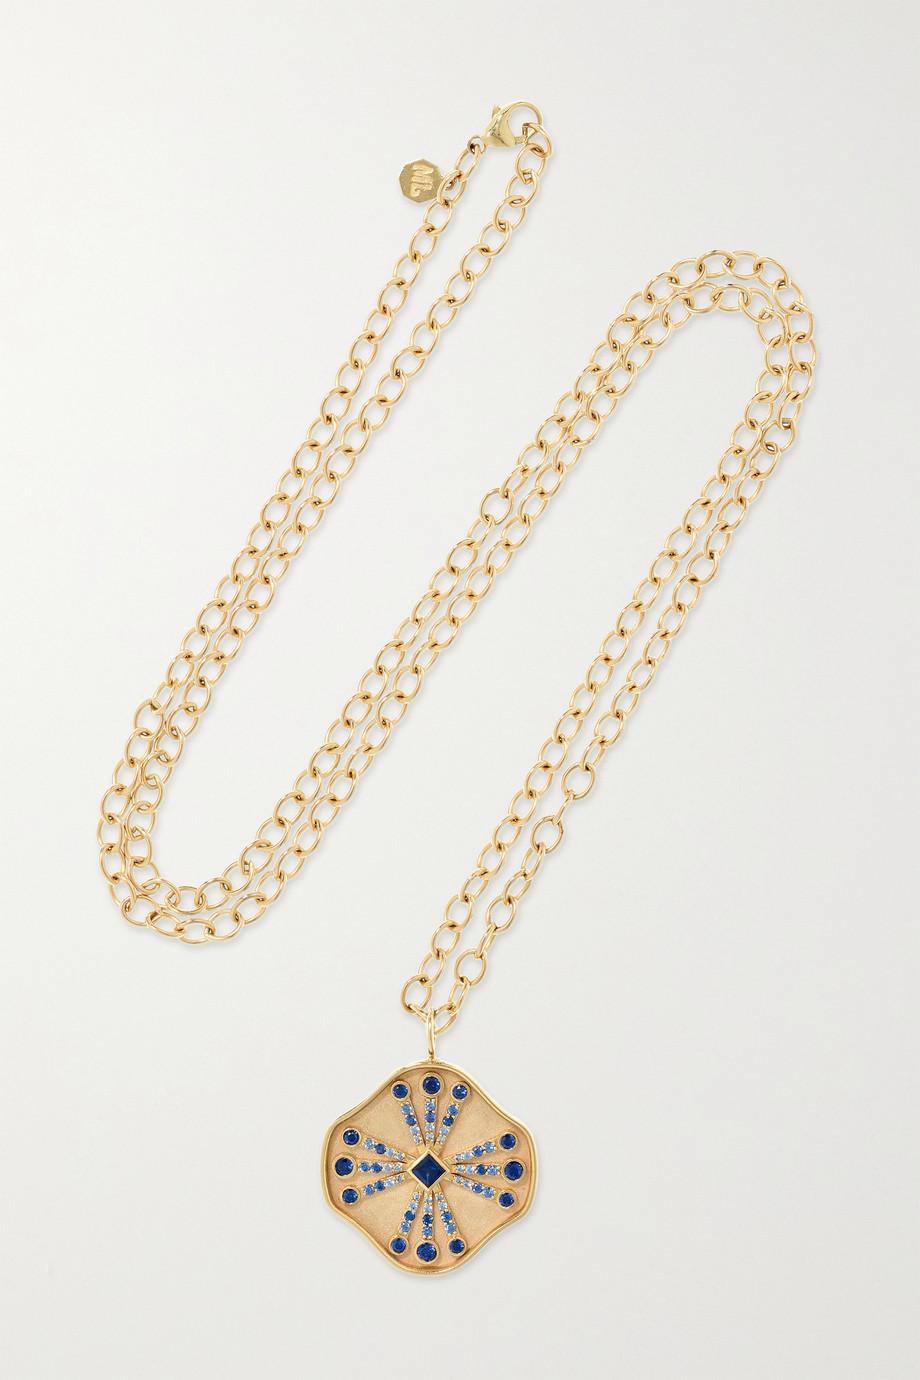 Marlo Laz Guiding Light 14-karat gold sapphire necklace